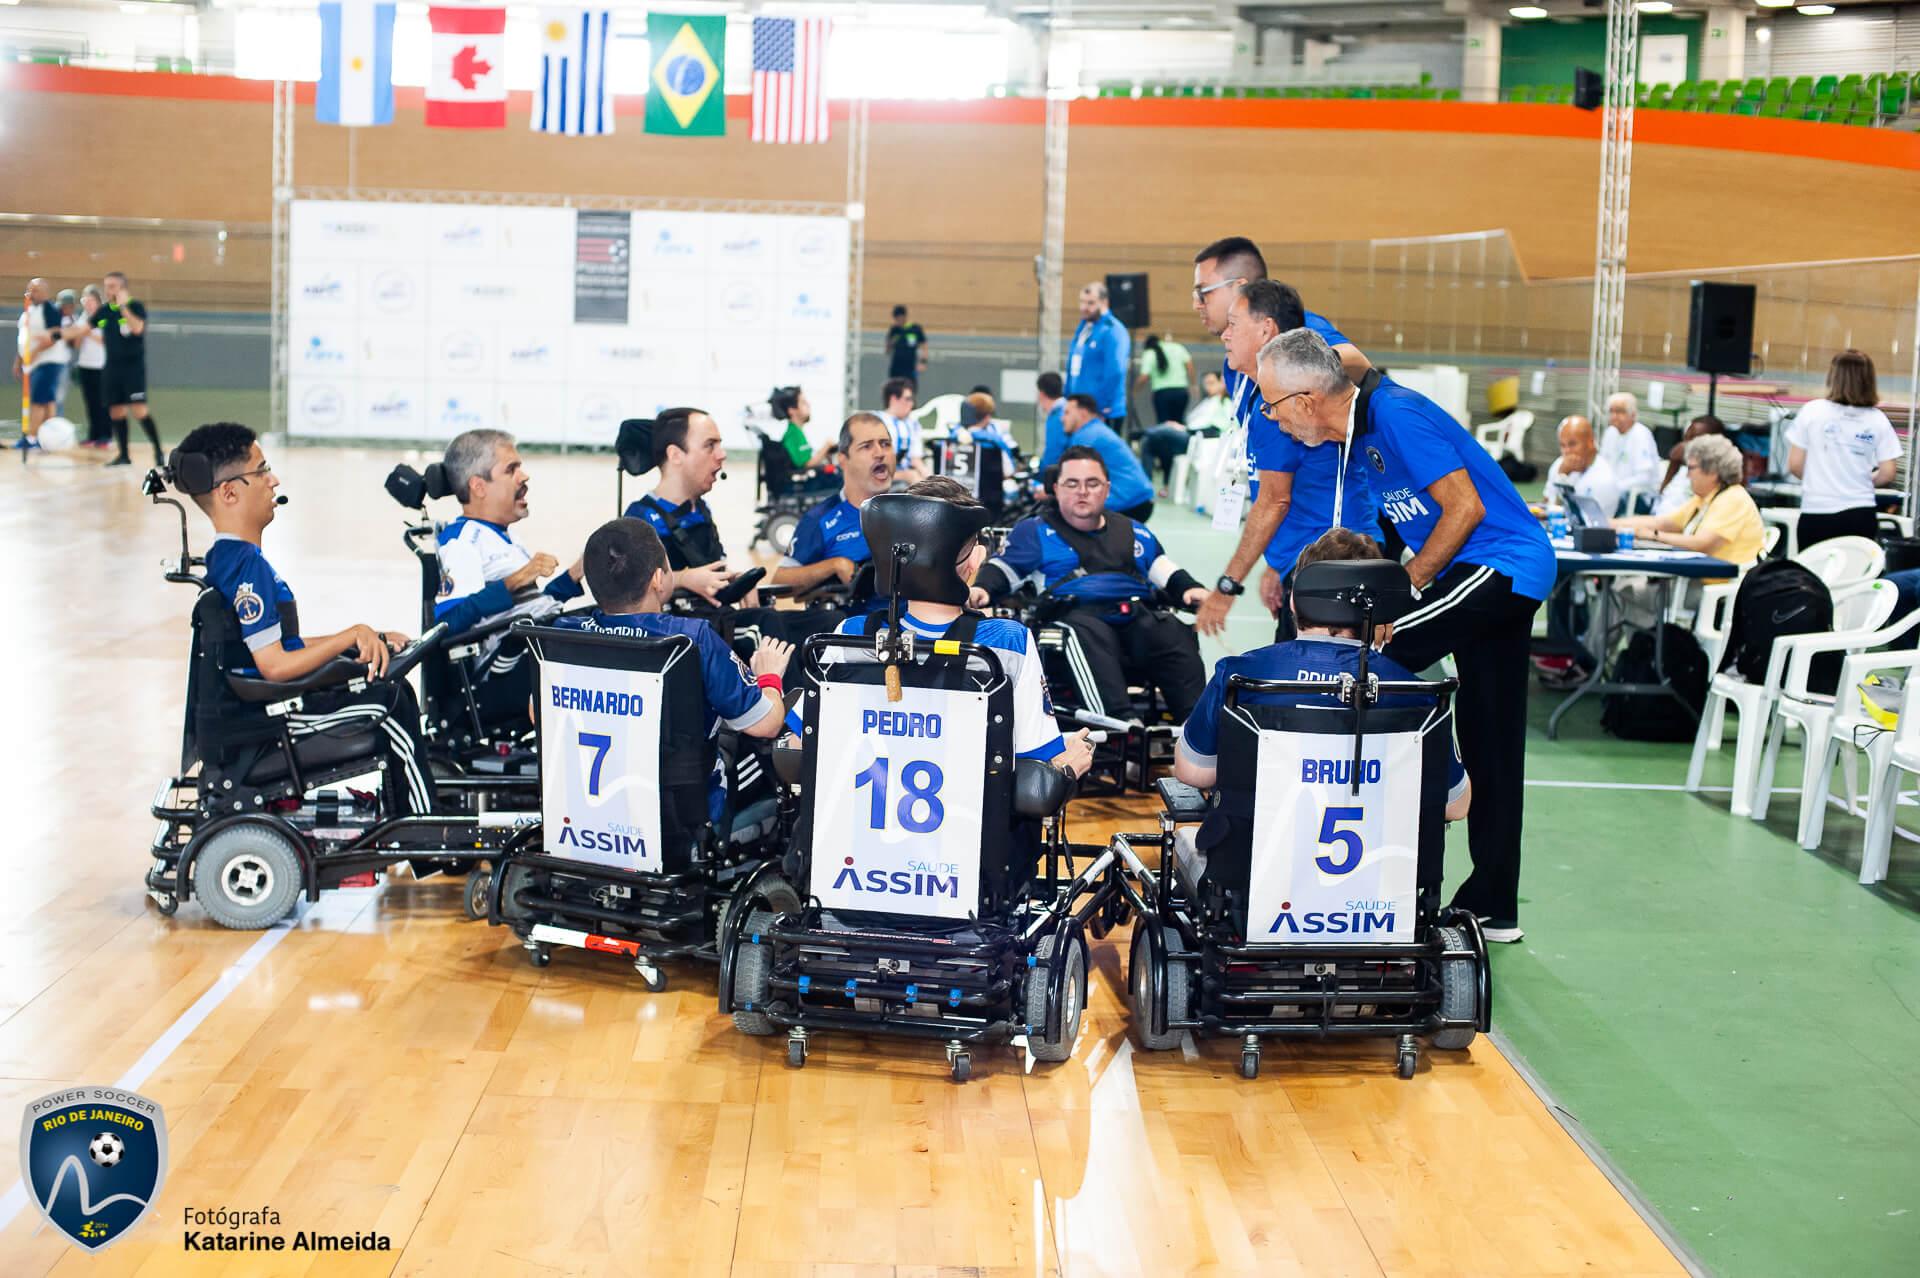 Champions Cup 2019 - Rio de Janeiro Power Soccer